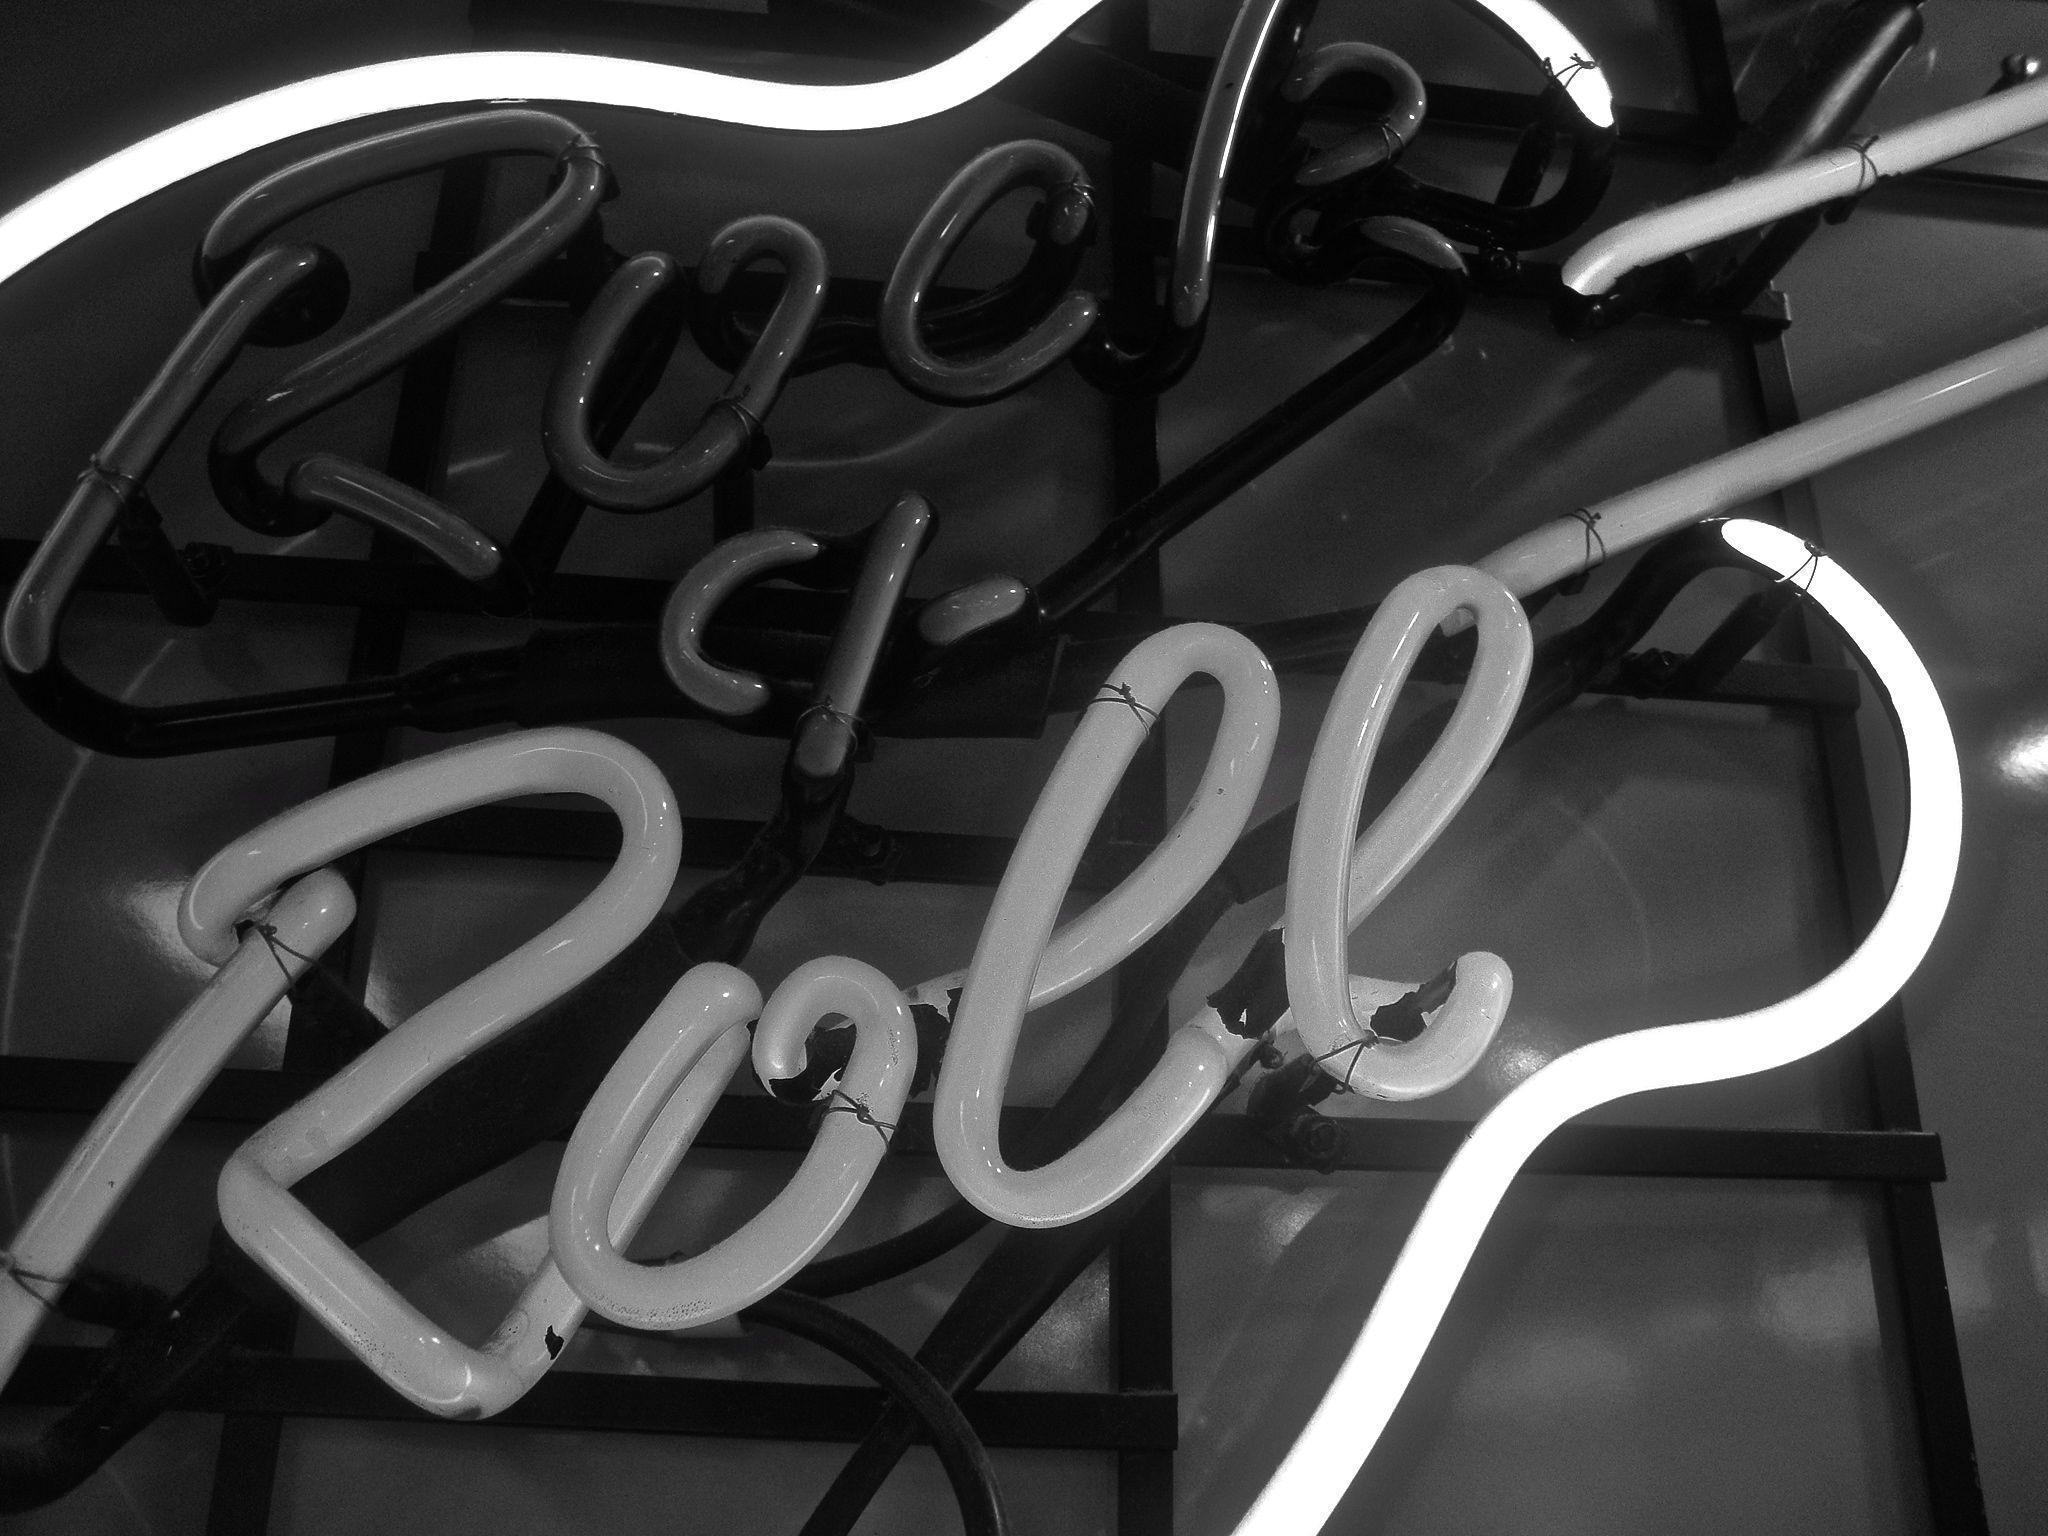 Rock Roll Wallpapers Wallpaper Cave